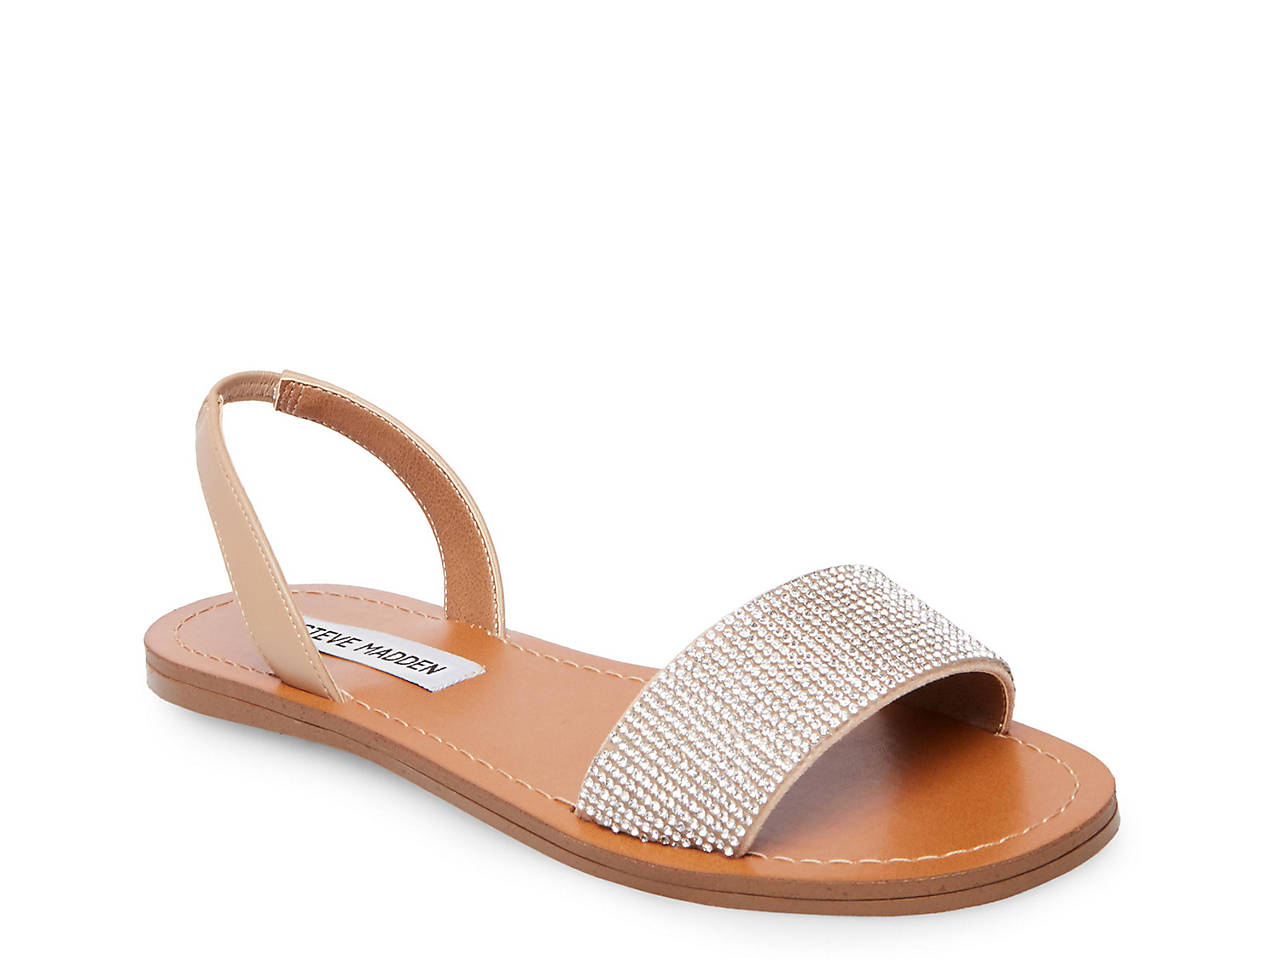 c4a6c6a9f51 Steve Madden Rock Flat Sandal Women s Shoes